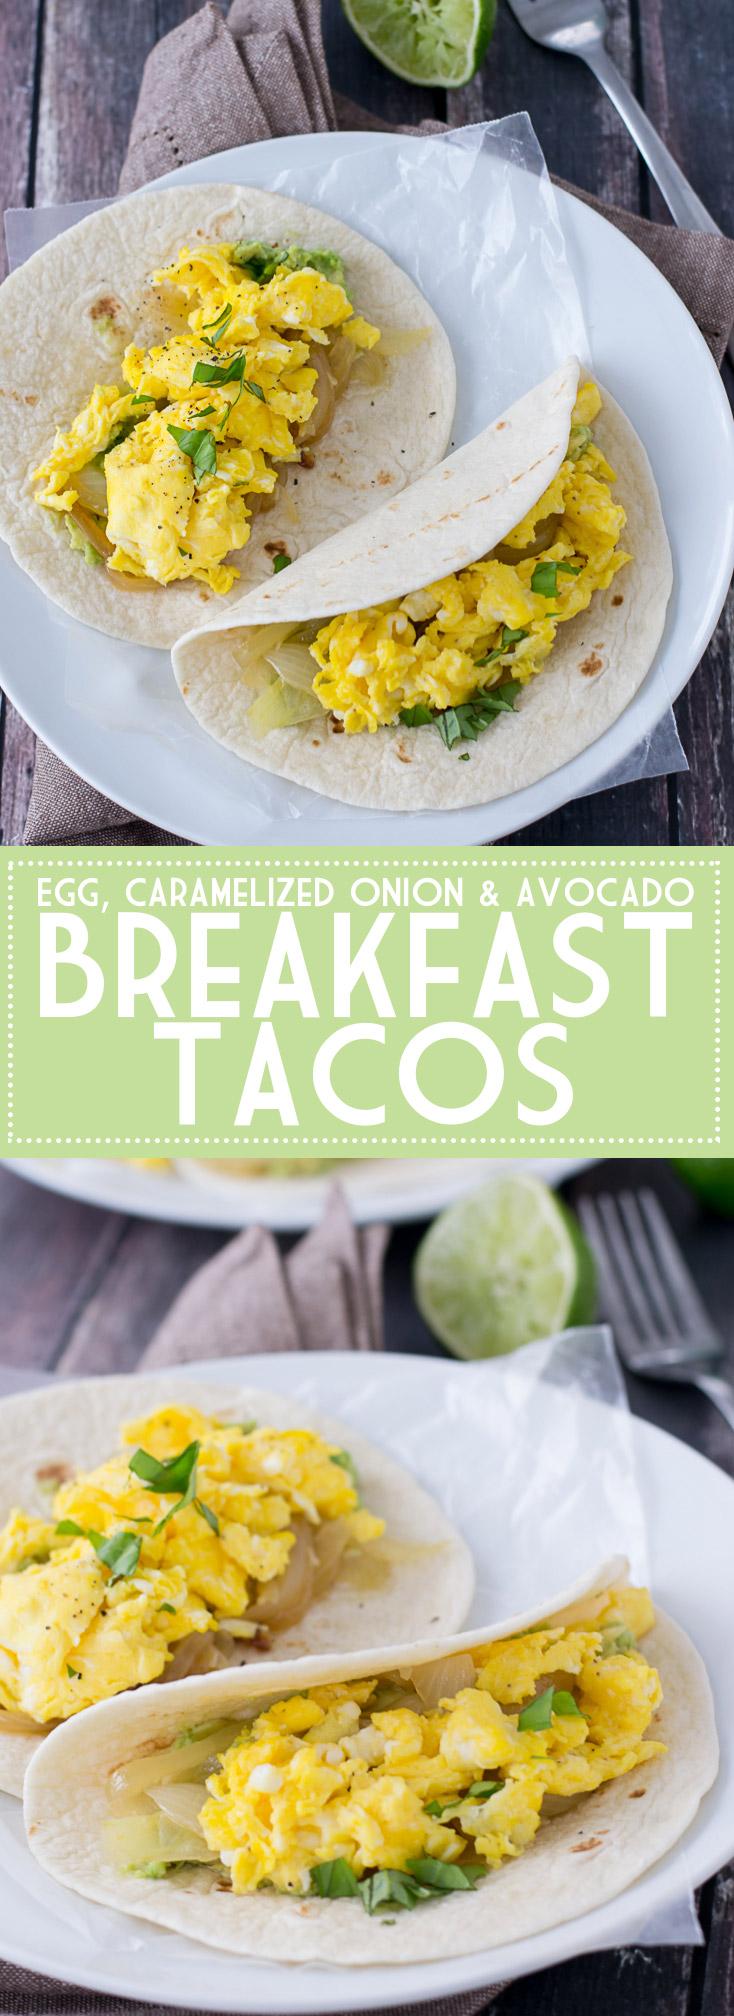 Breakfast Tacos | www.motherthyme.com